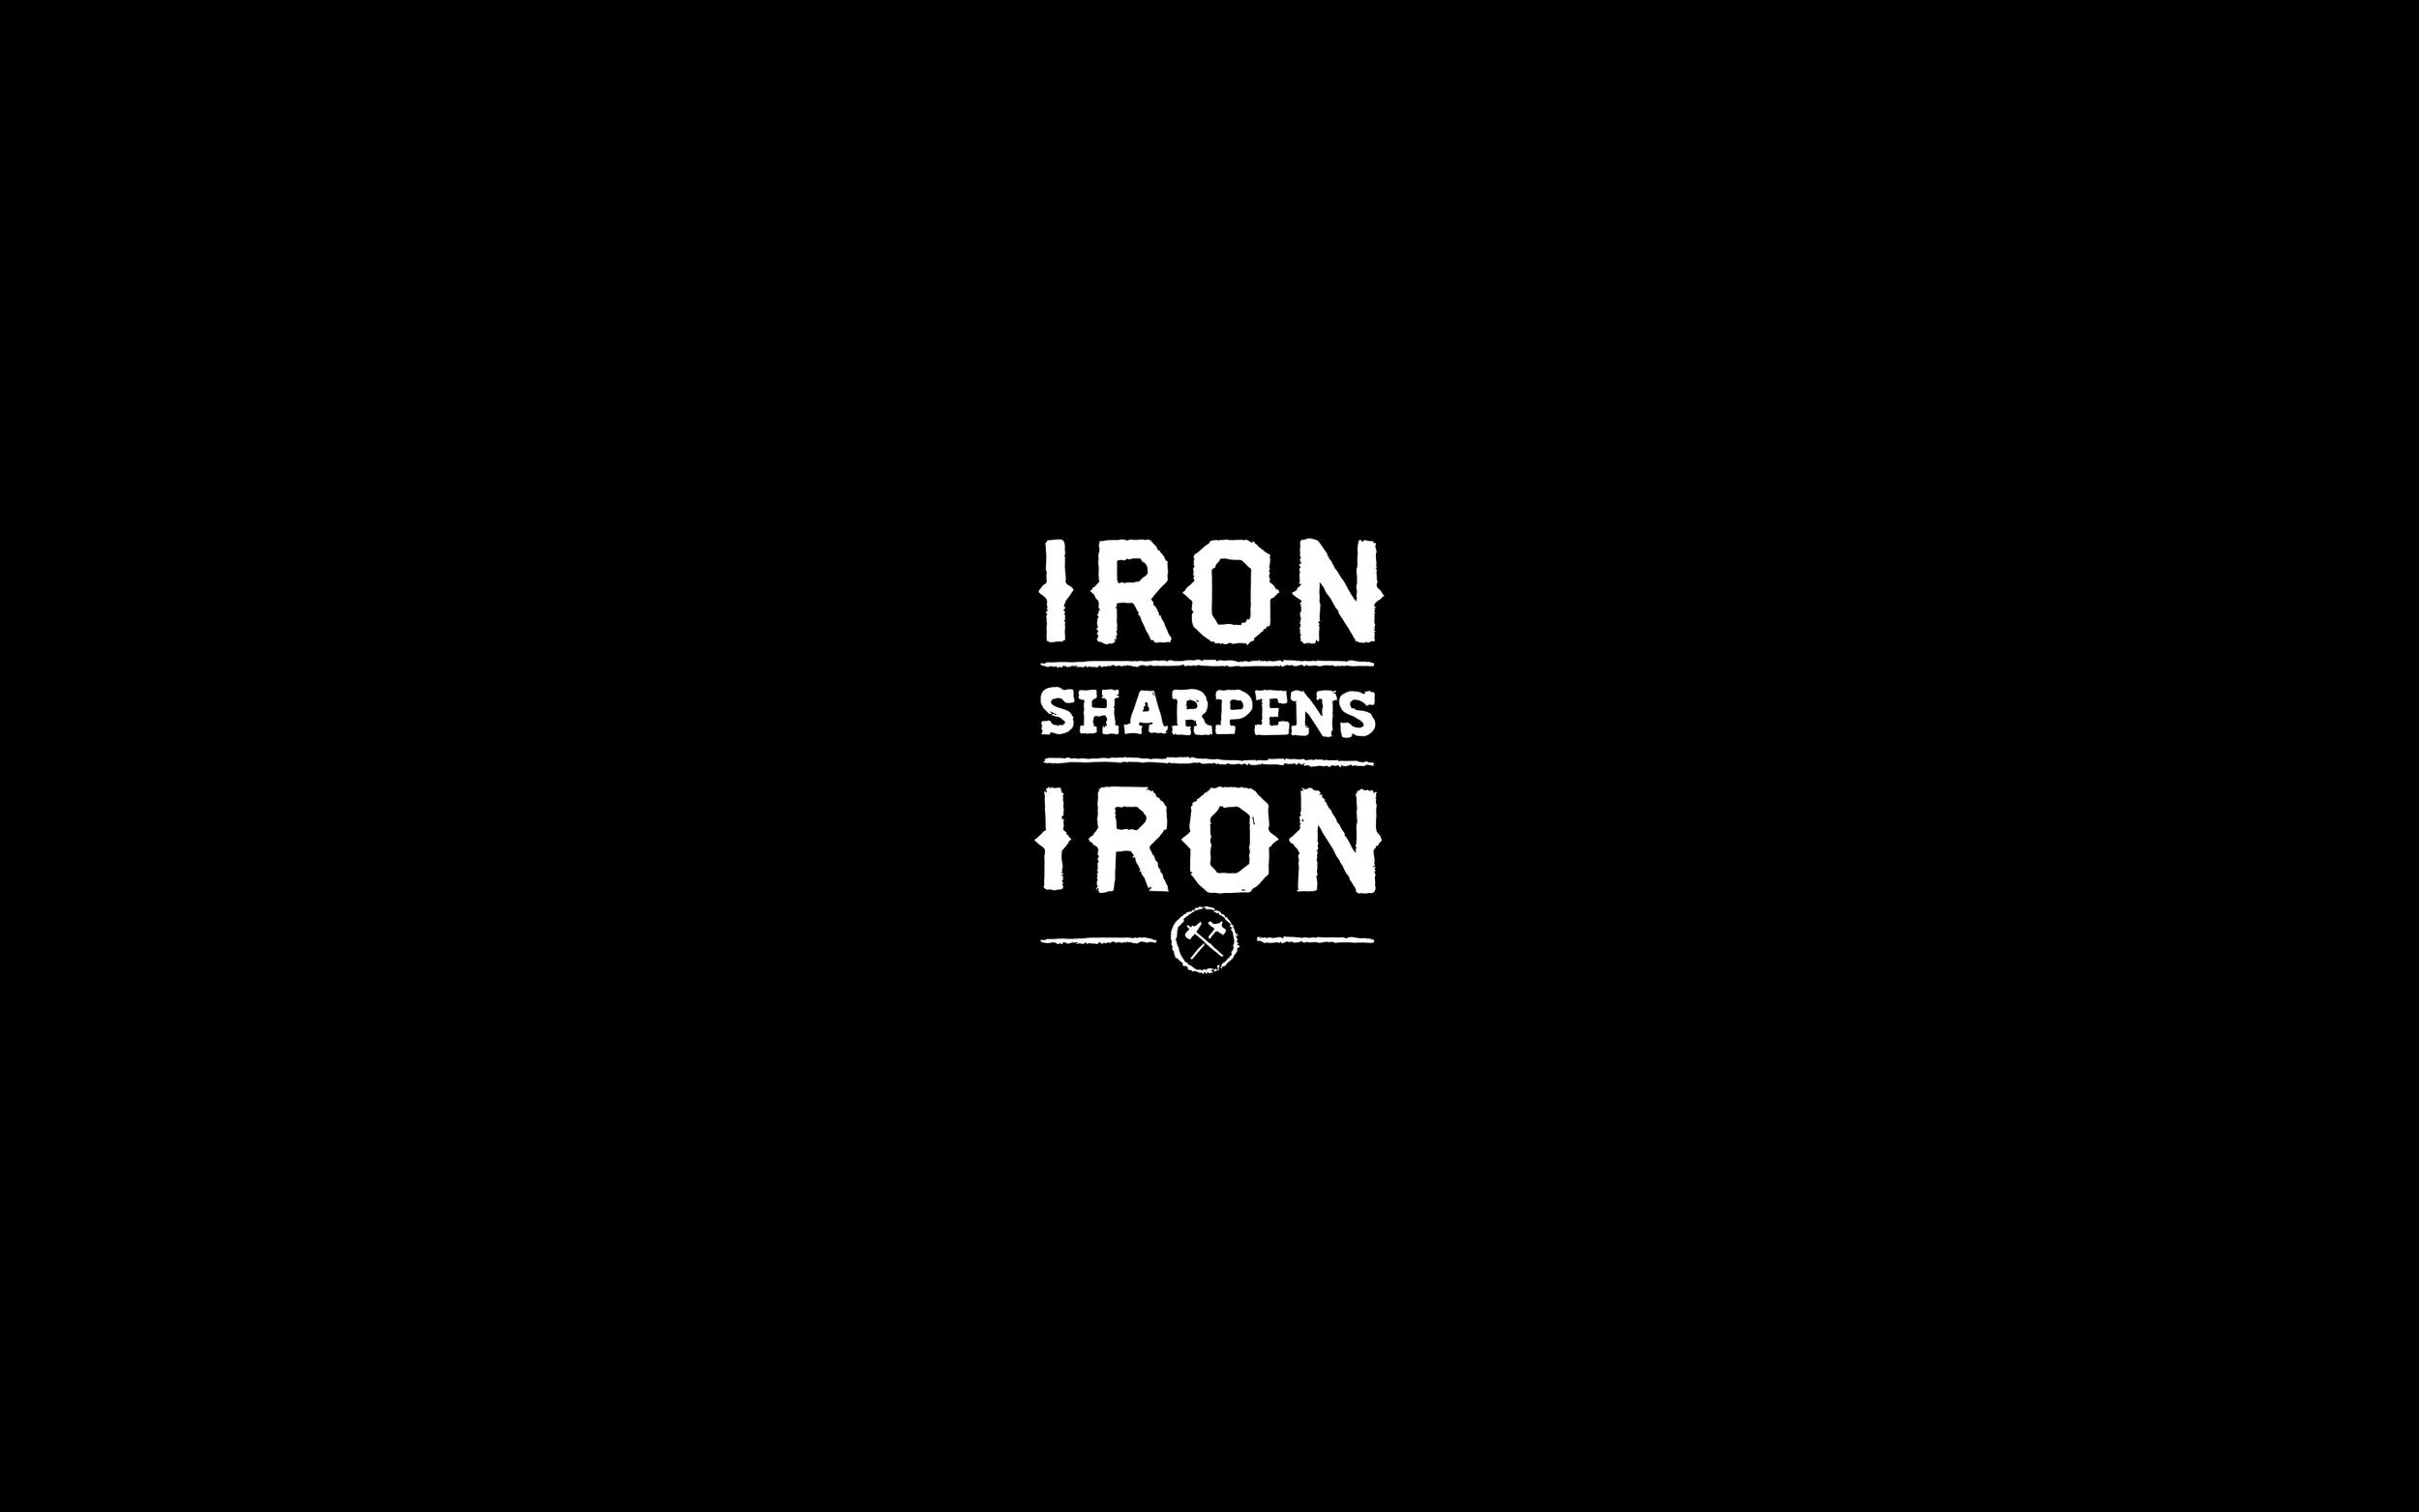 Iron-MacBook-Pro.png